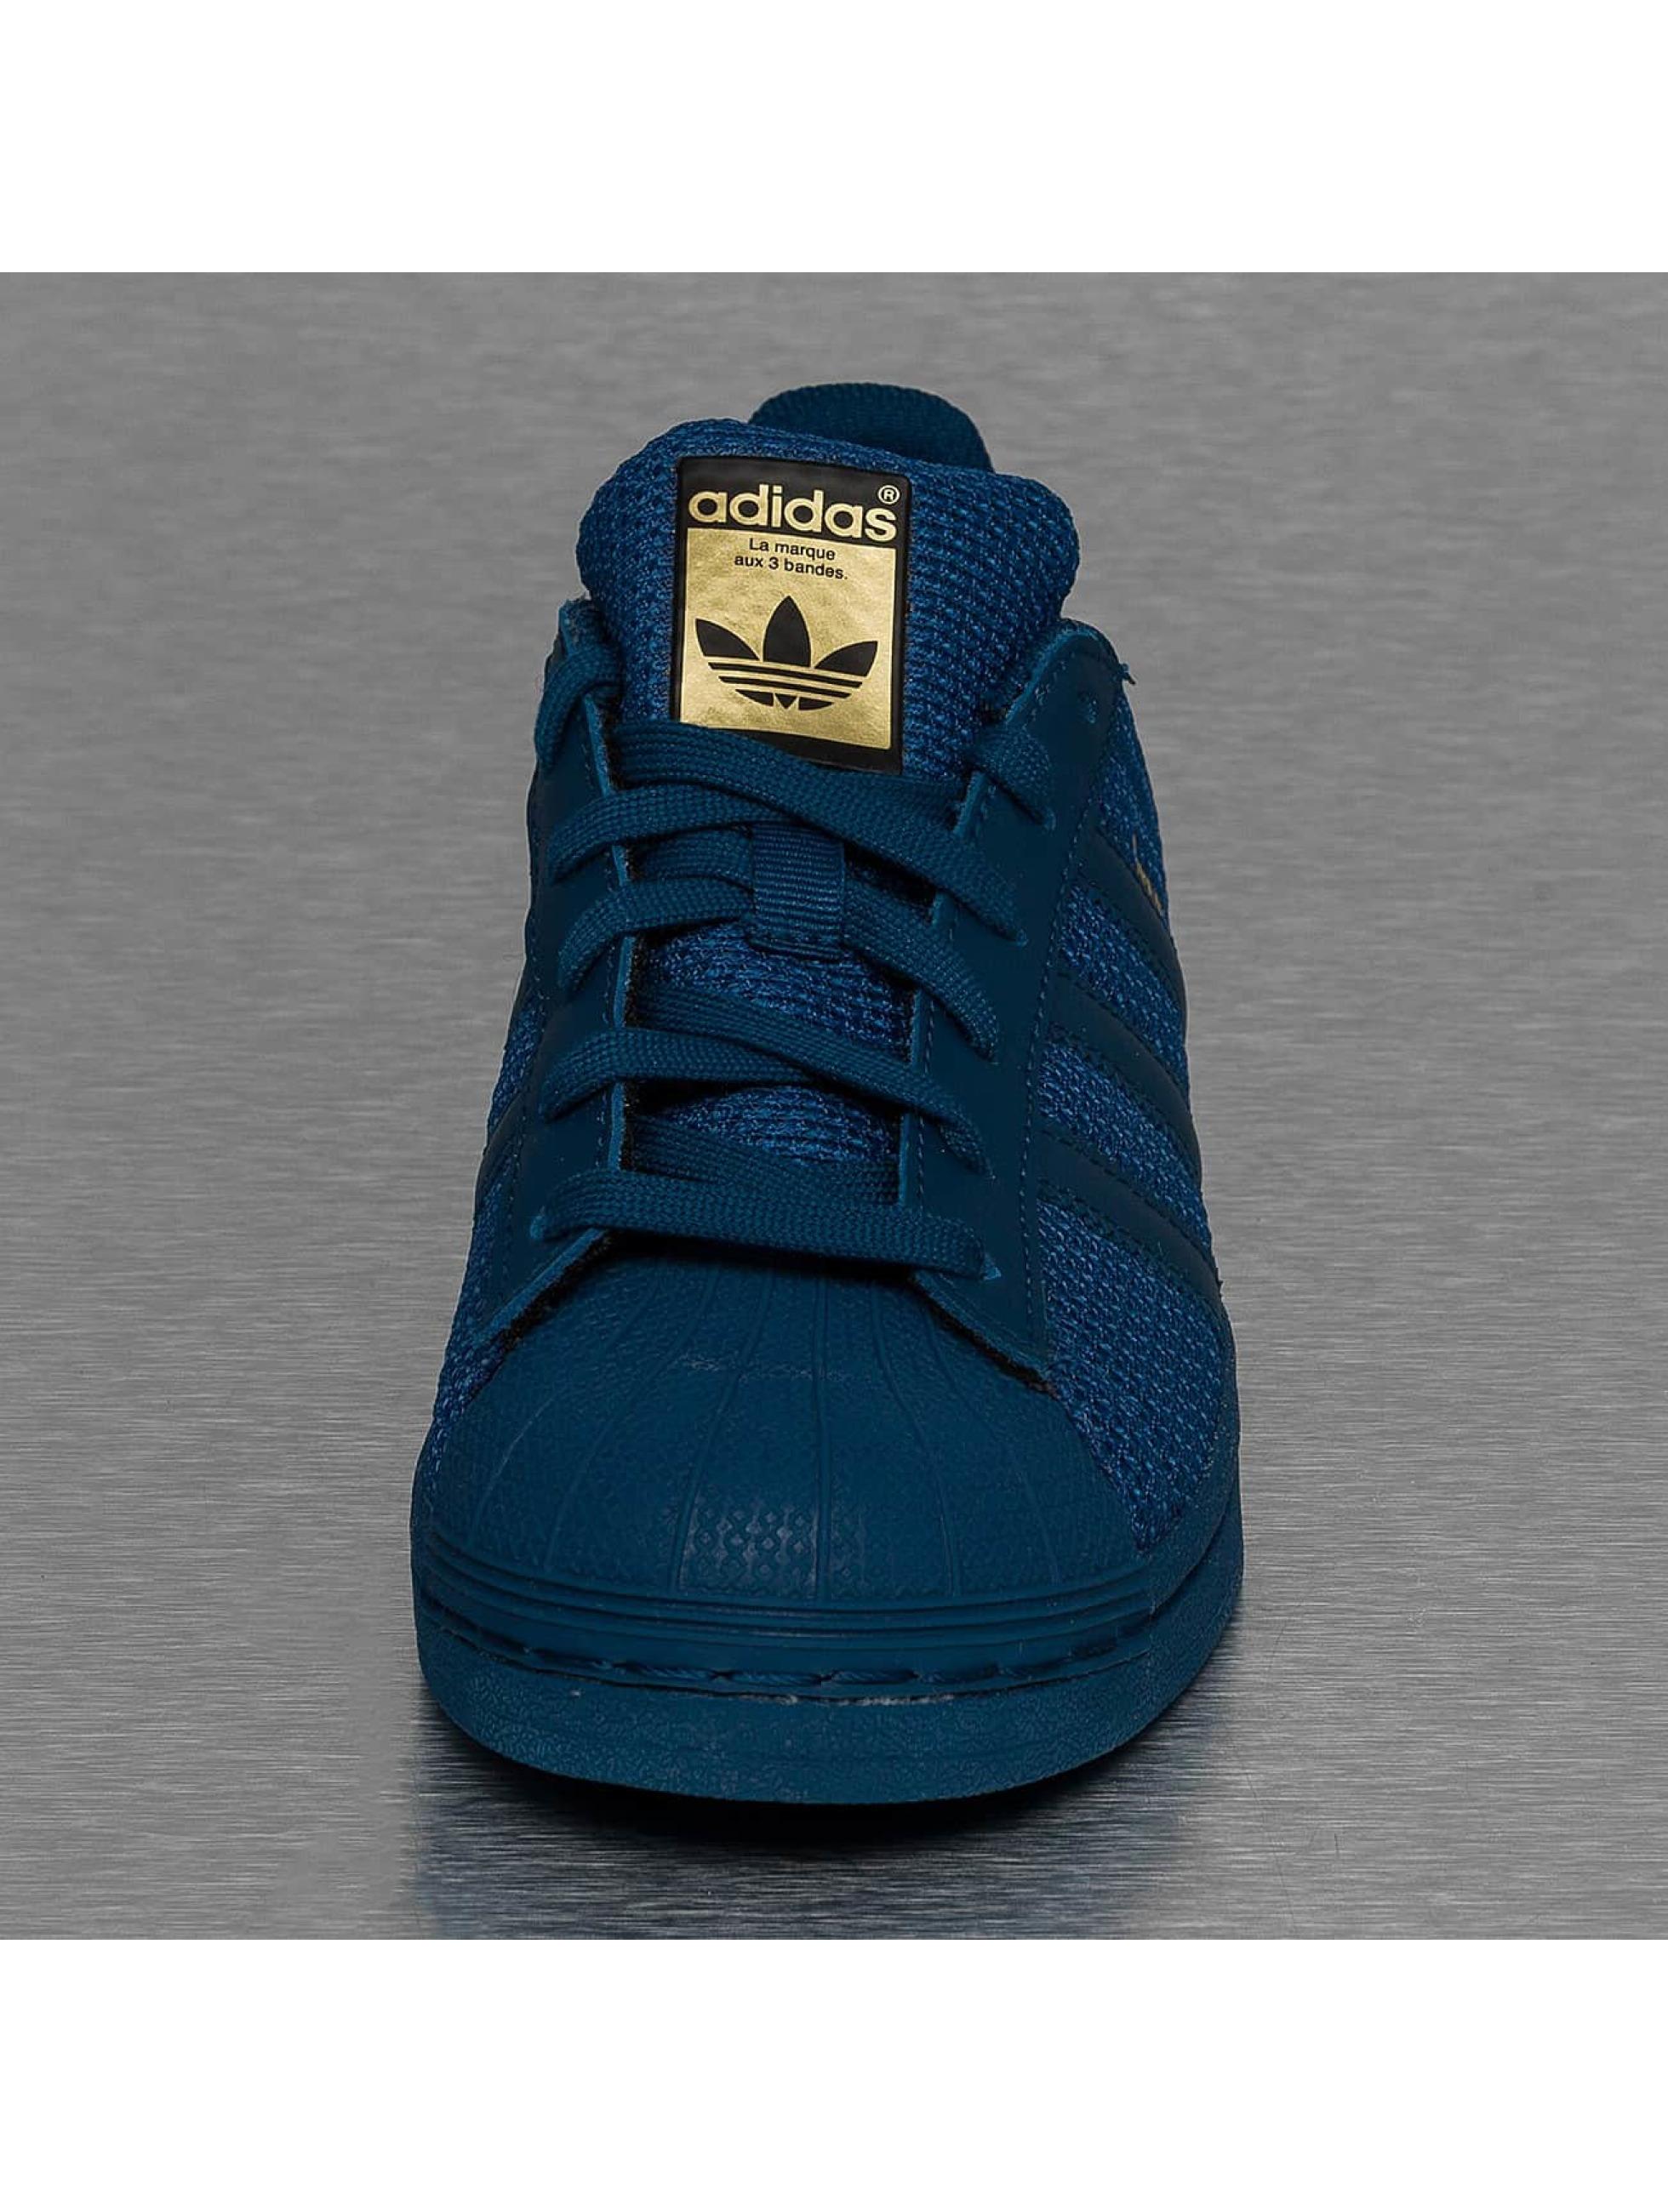 adidas damen schuhe sneaker superstar ebay. Black Bedroom Furniture Sets. Home Design Ideas